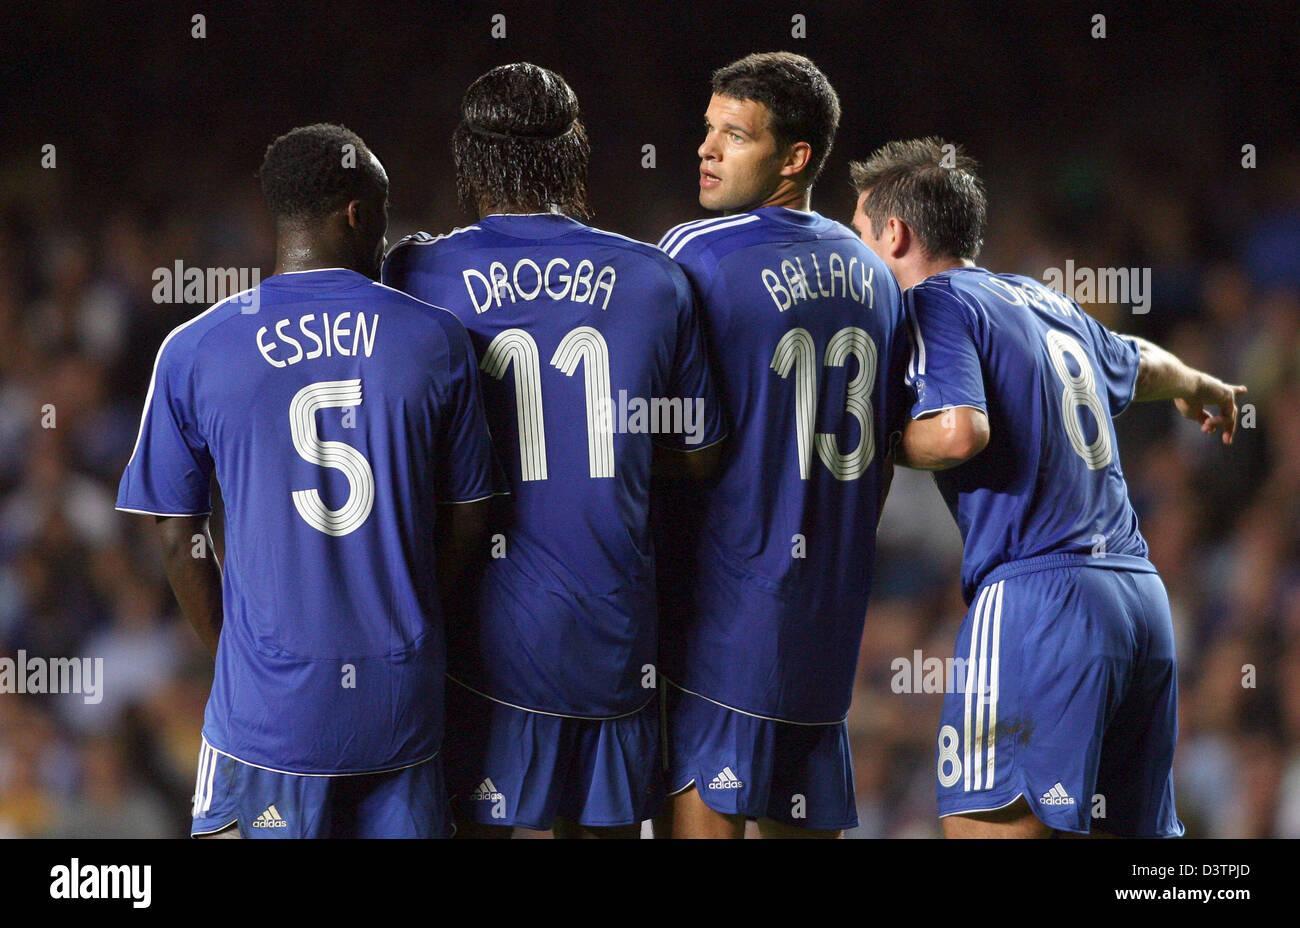 Chelsea players L R Michael Essien Di r Drogba Michael